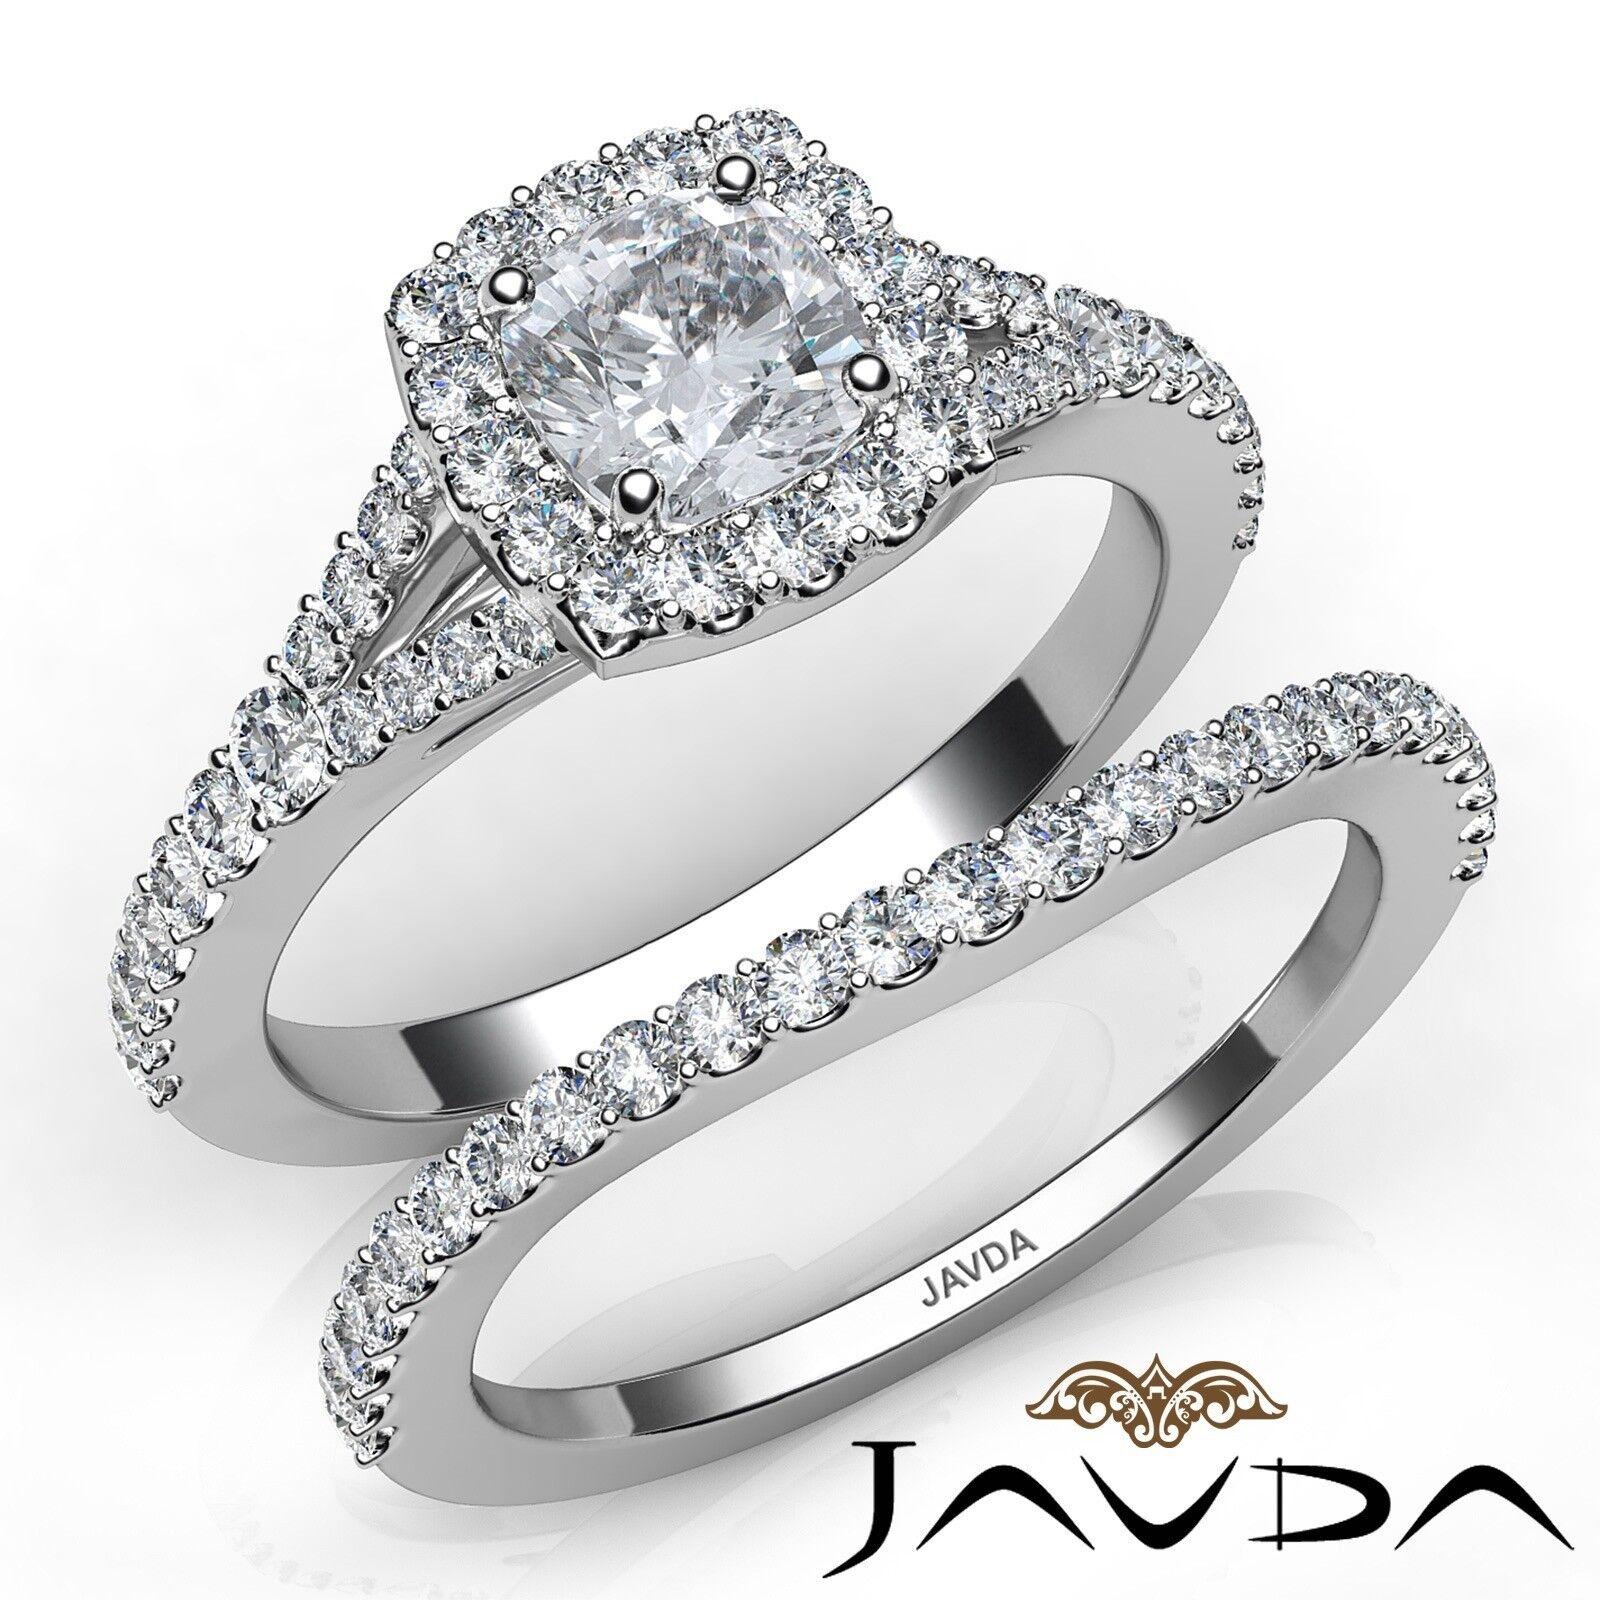 1.42ctw U Cut Pave Halo Bridal Cushion Diamond Engagement Ring GIA E-VS1 W Gold